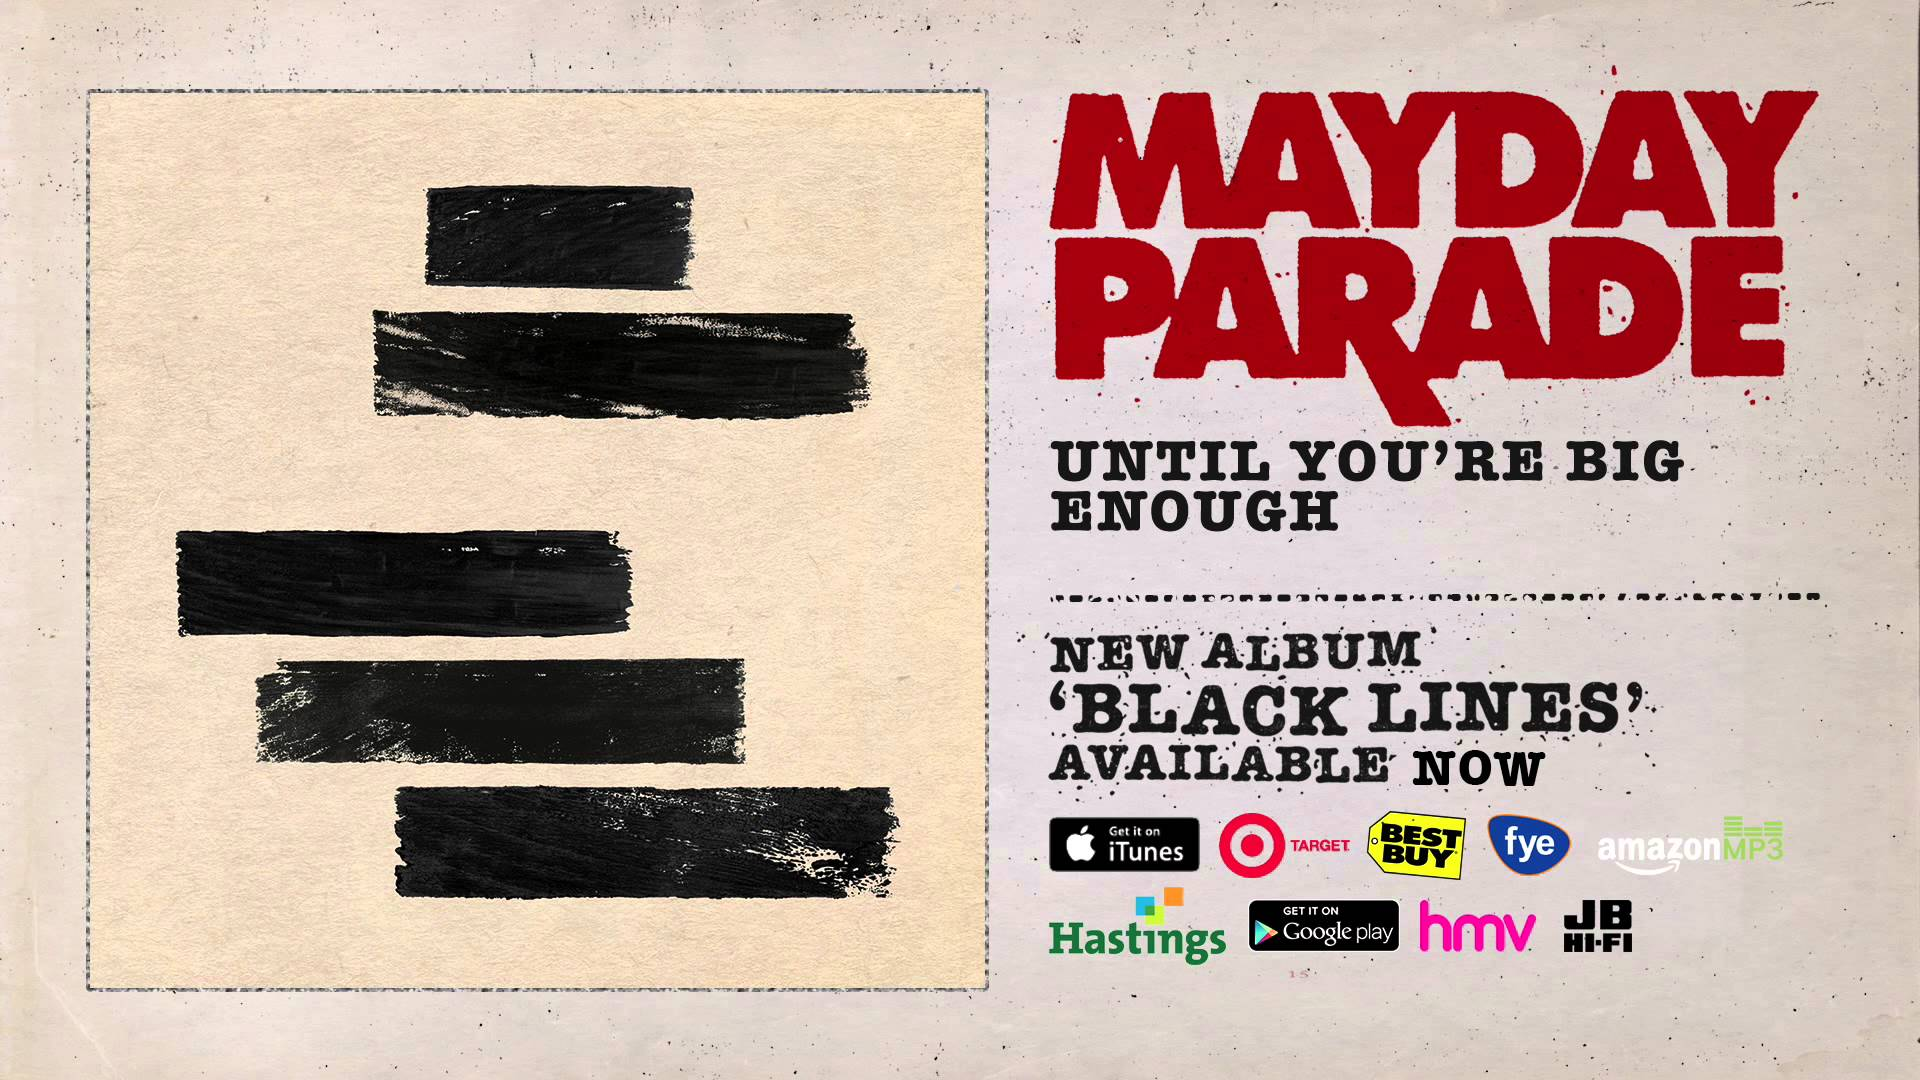 Mayday Parade - Until You're Big Enough